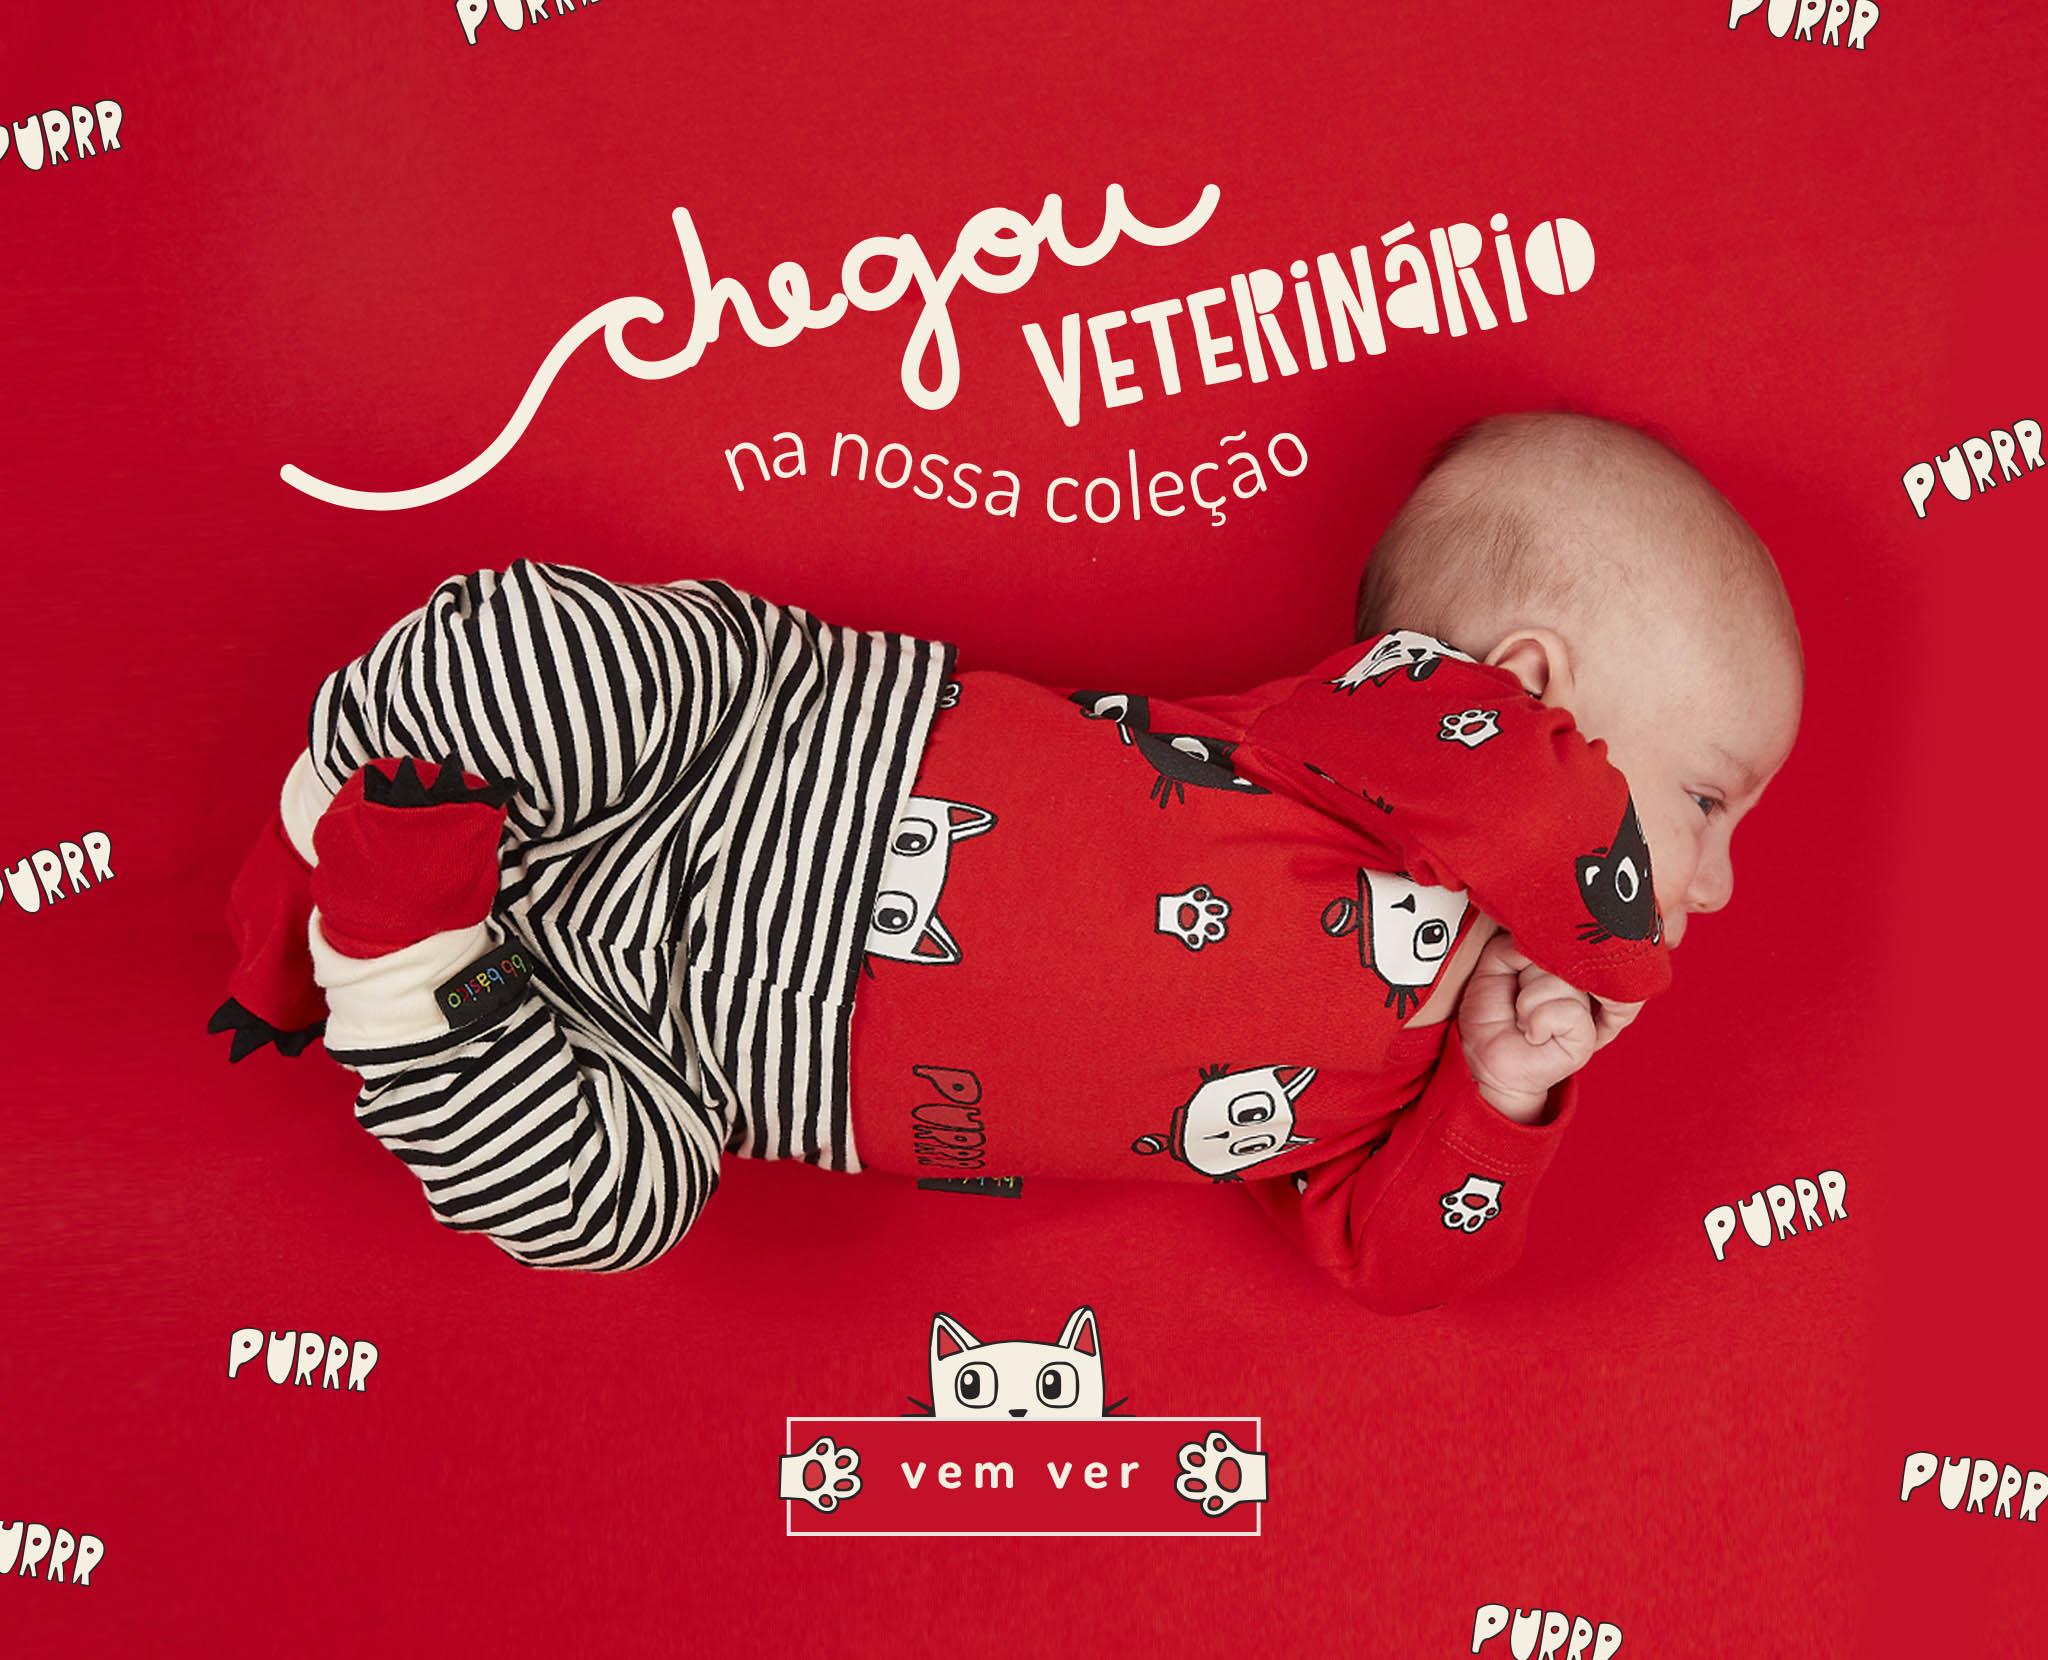 veterinario